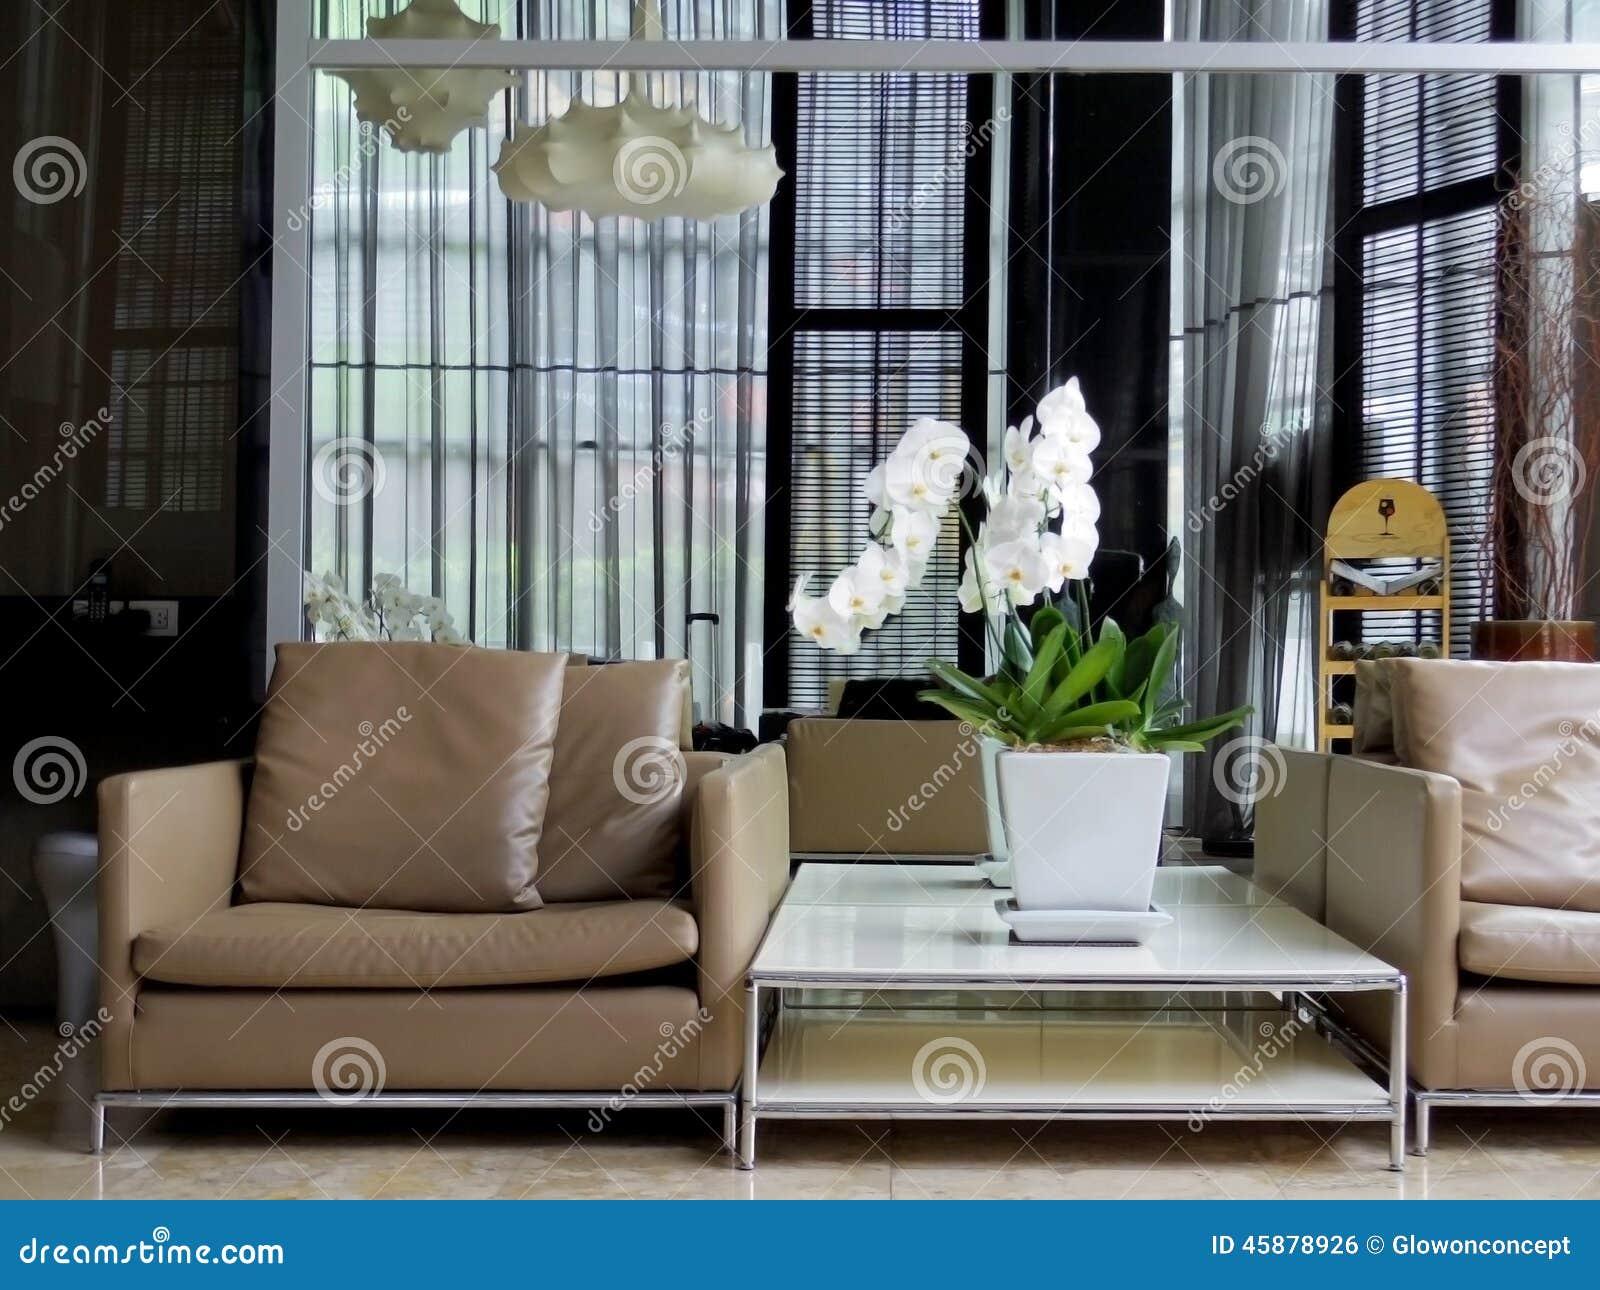 Modern lobby interior design stock photo image of orchid for Hotel lobby decor photos